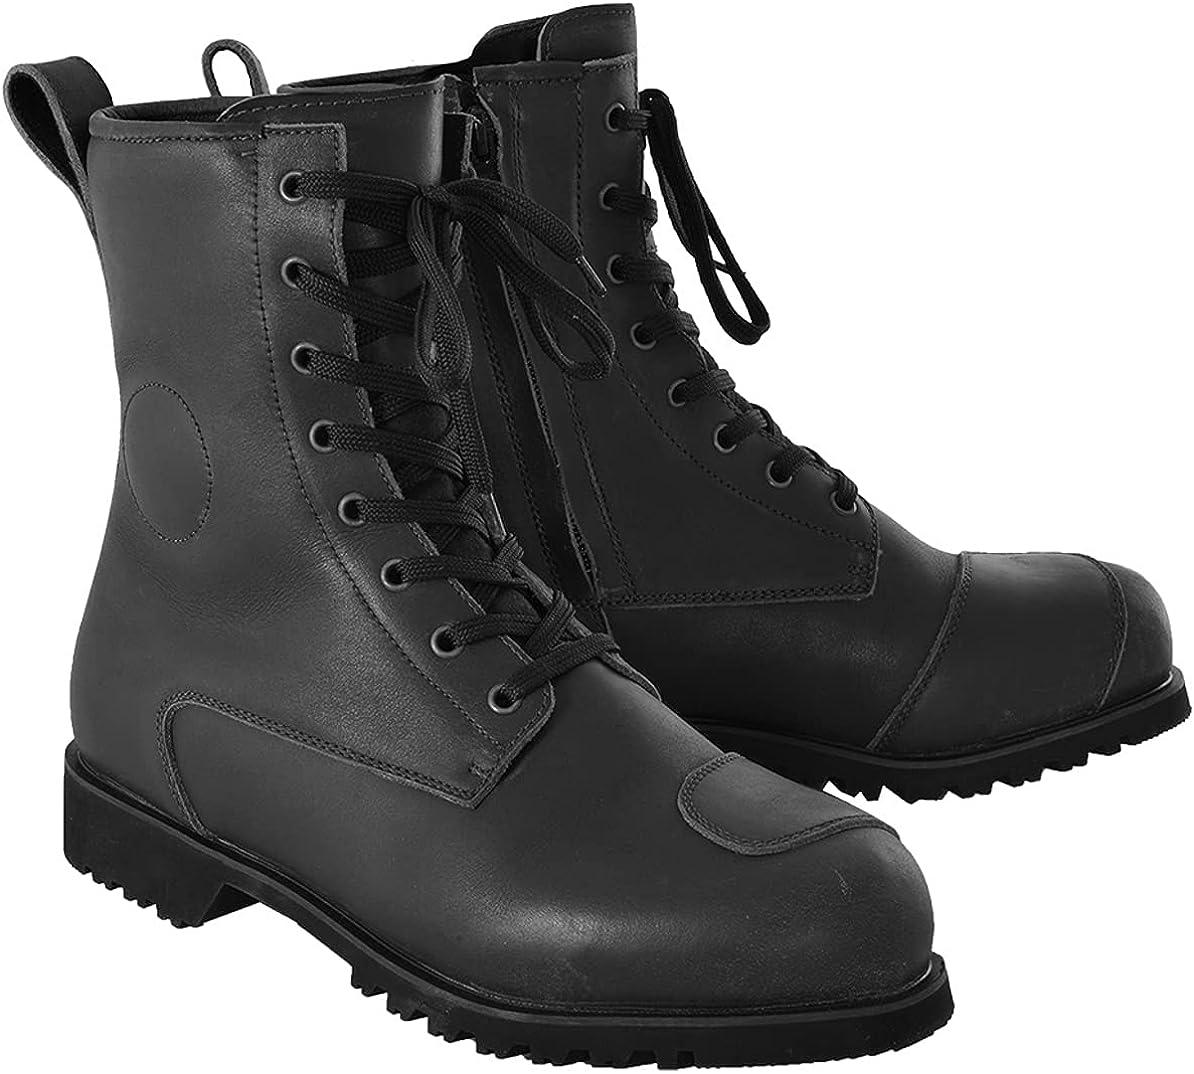 Oxford Unisex-Adult Merton Boots Black, Size: USA 9 (Euro 43) (,)